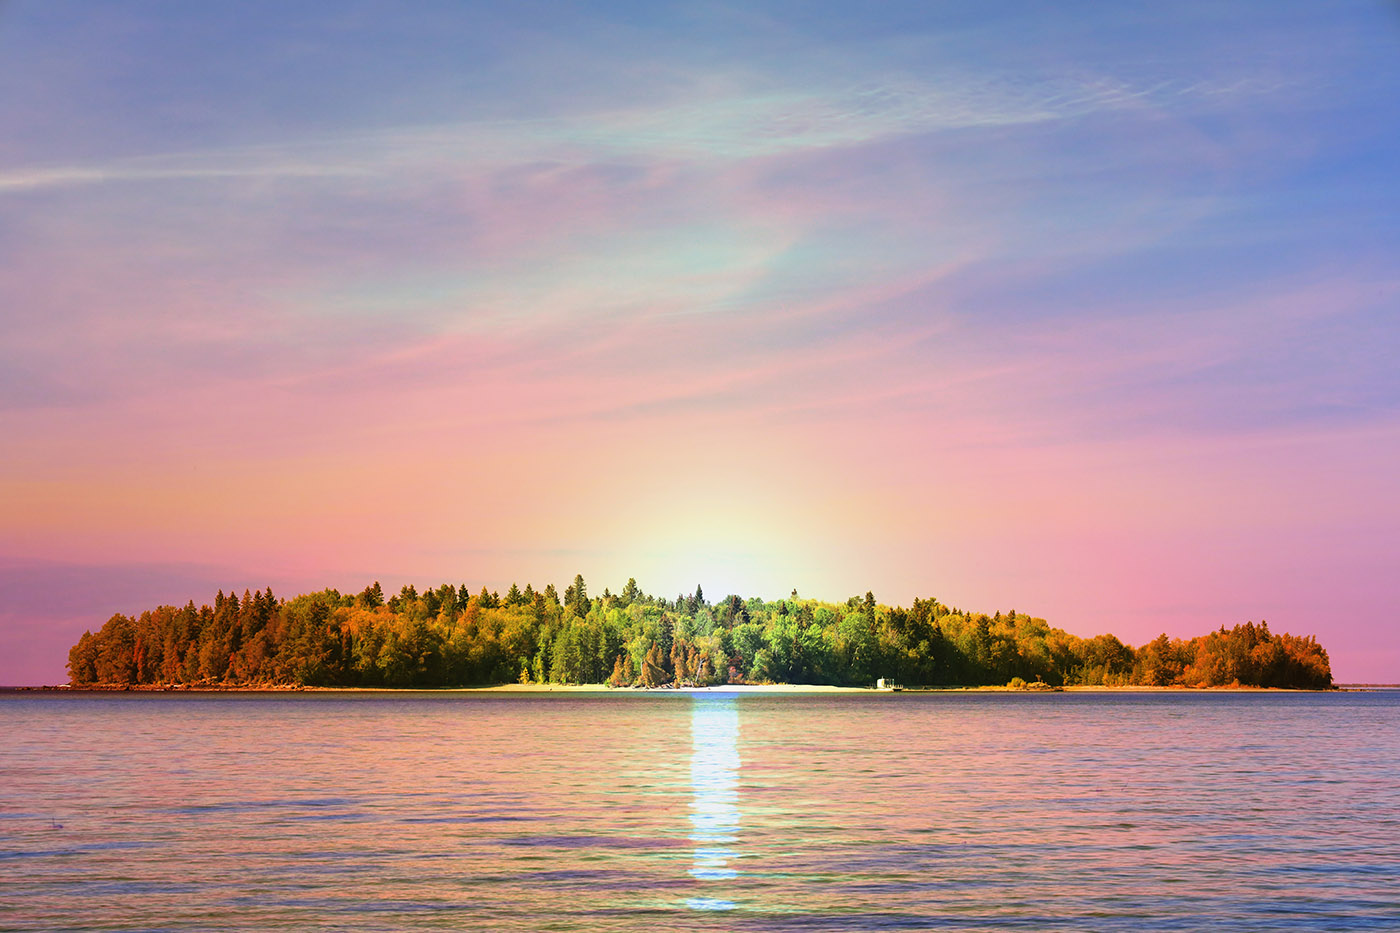 Peaceful Remote Island - Colorful Stock Photos